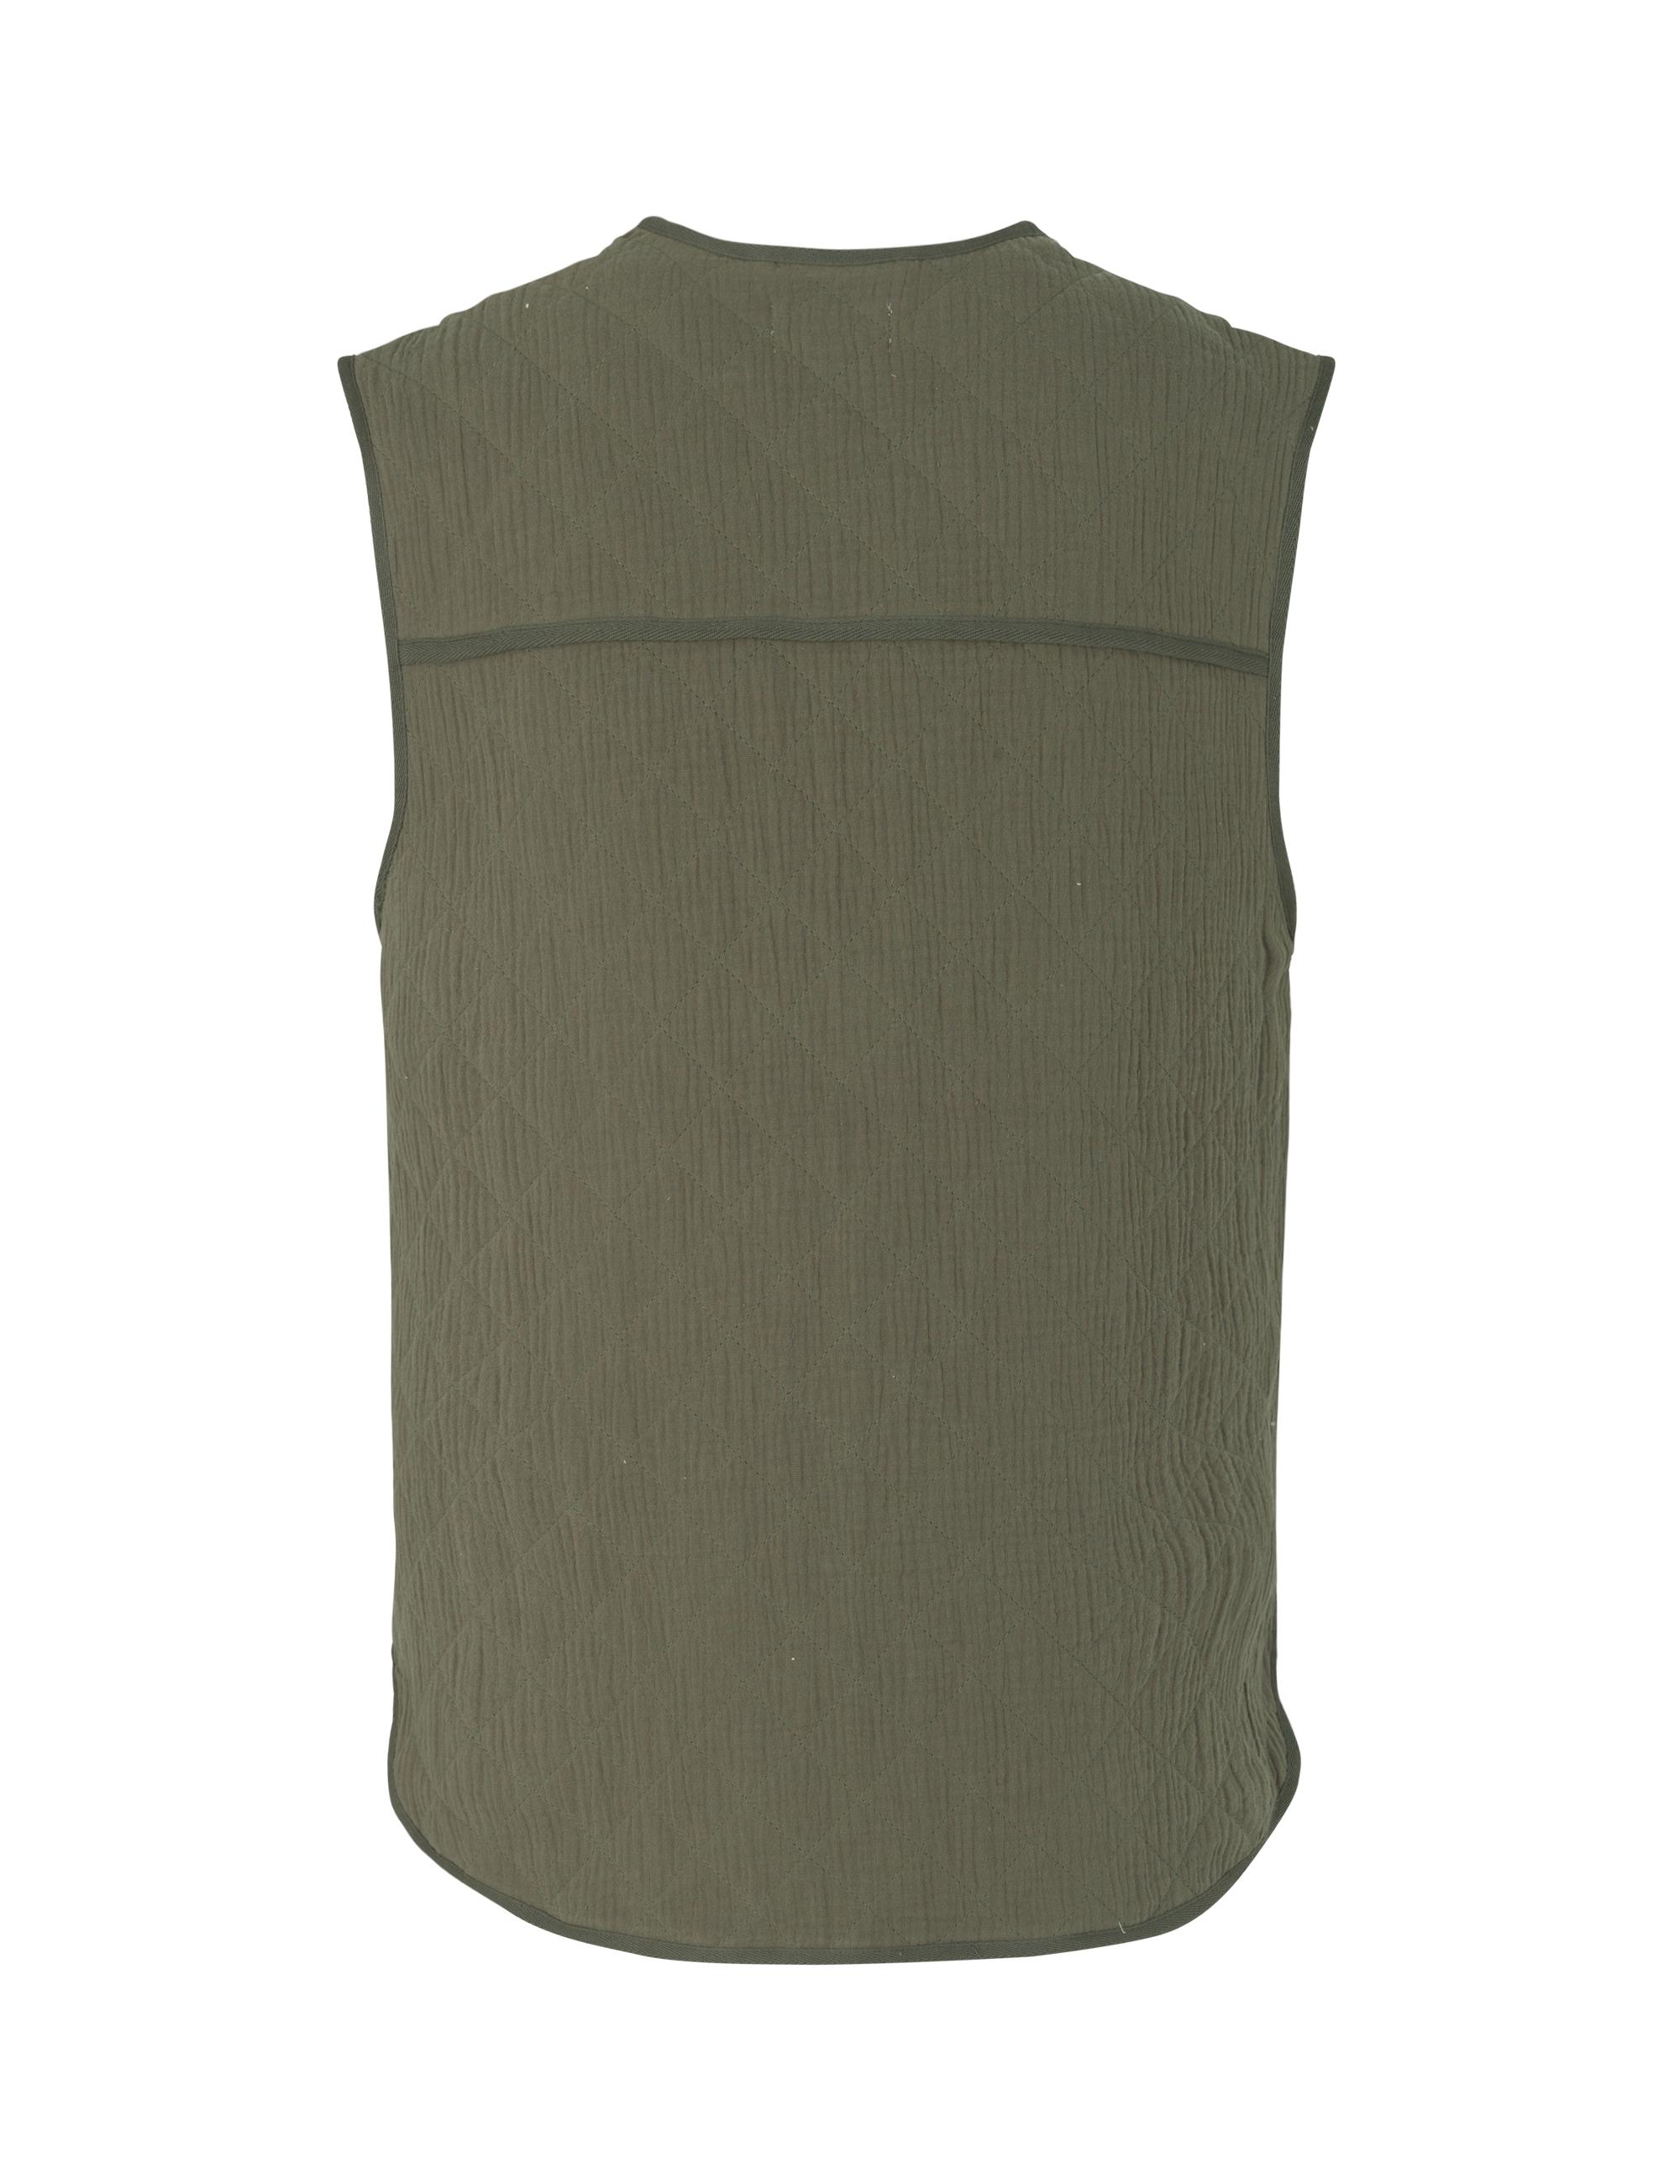 Global Funk Feeney vest, army, x-small